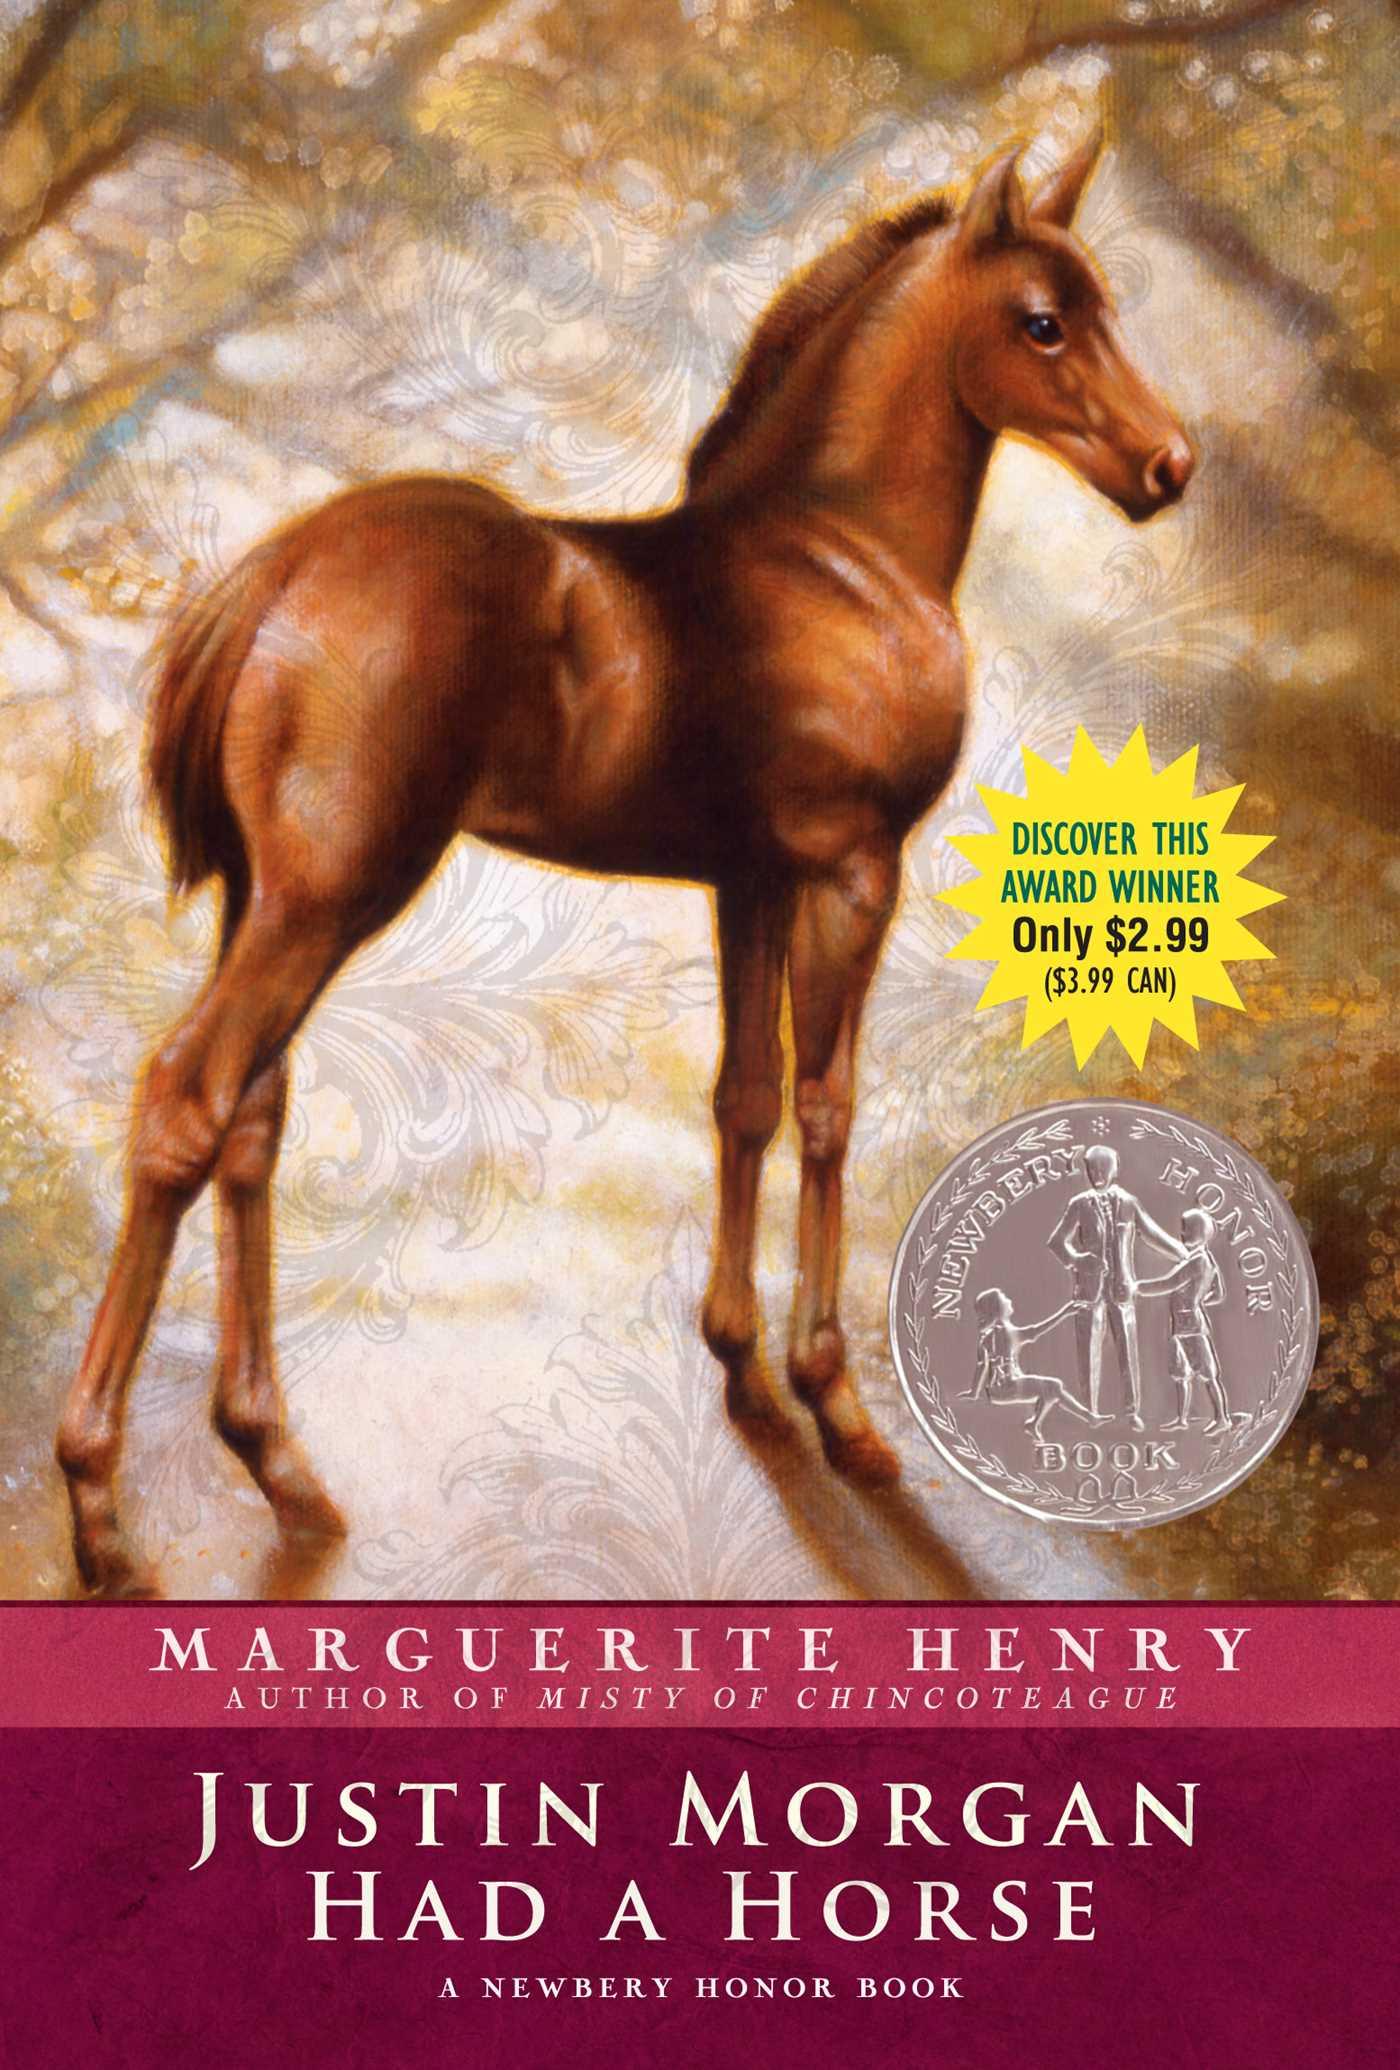 Justin morgan had a horse 9781442488014 hr